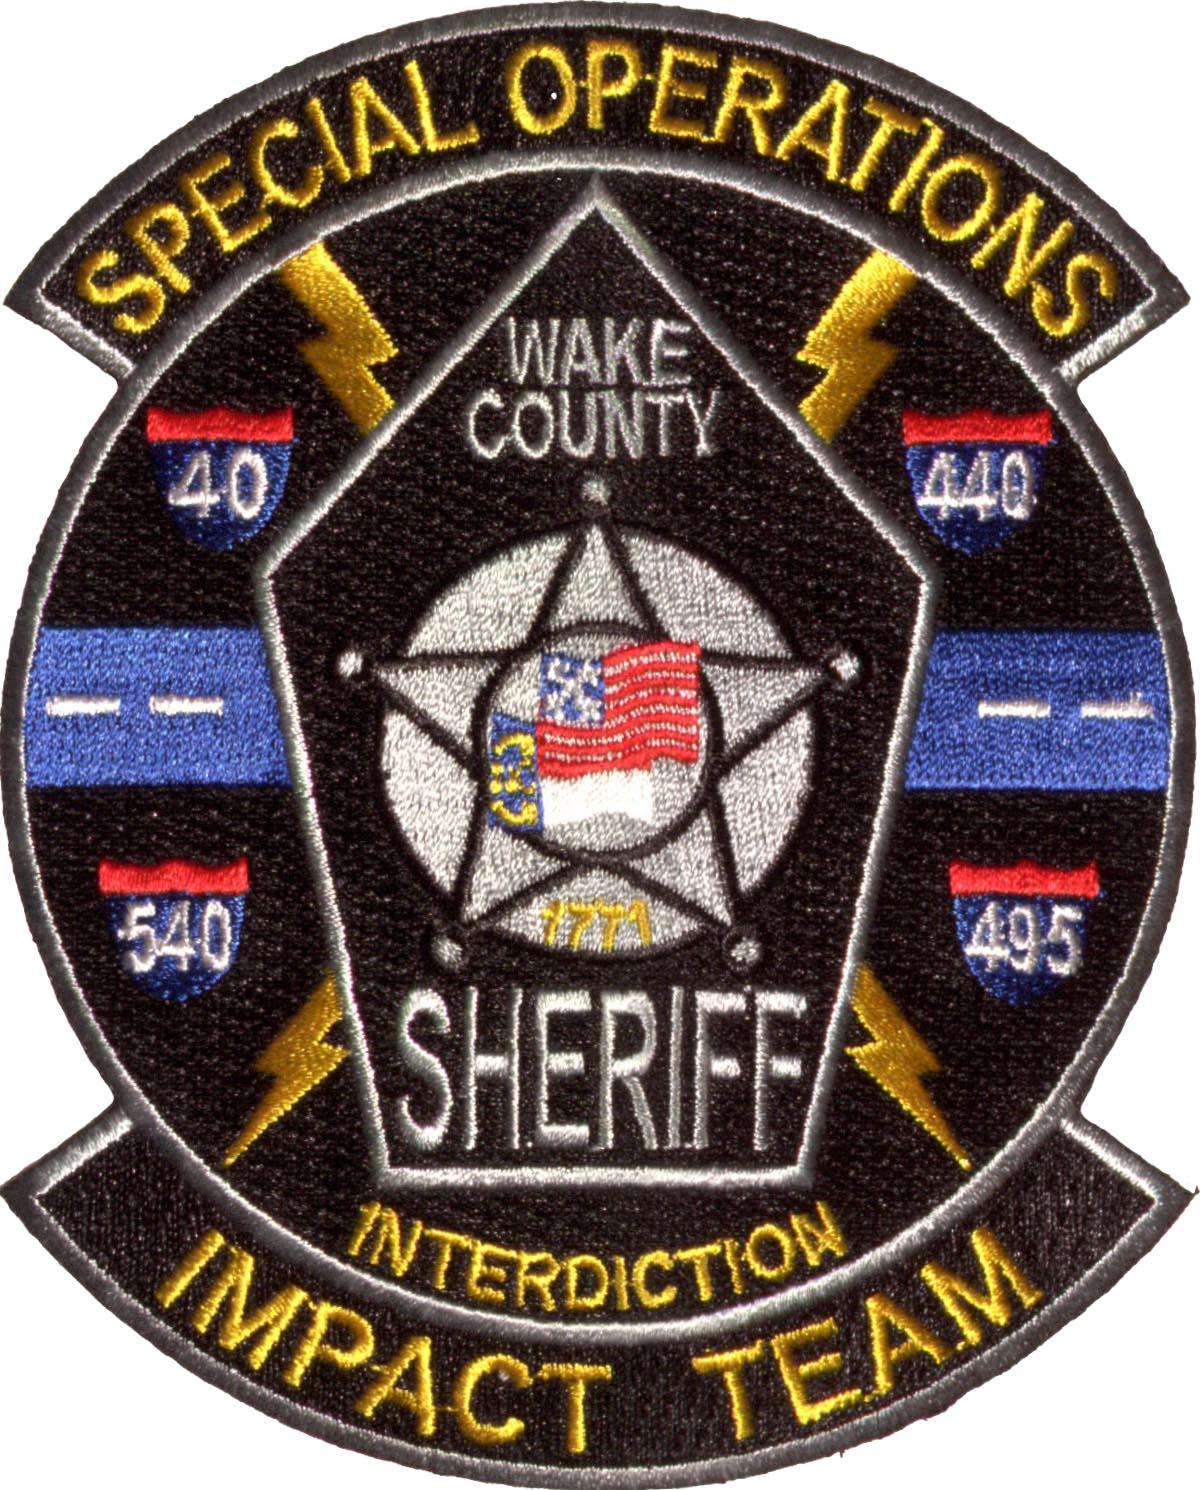 Special Operations Emblems